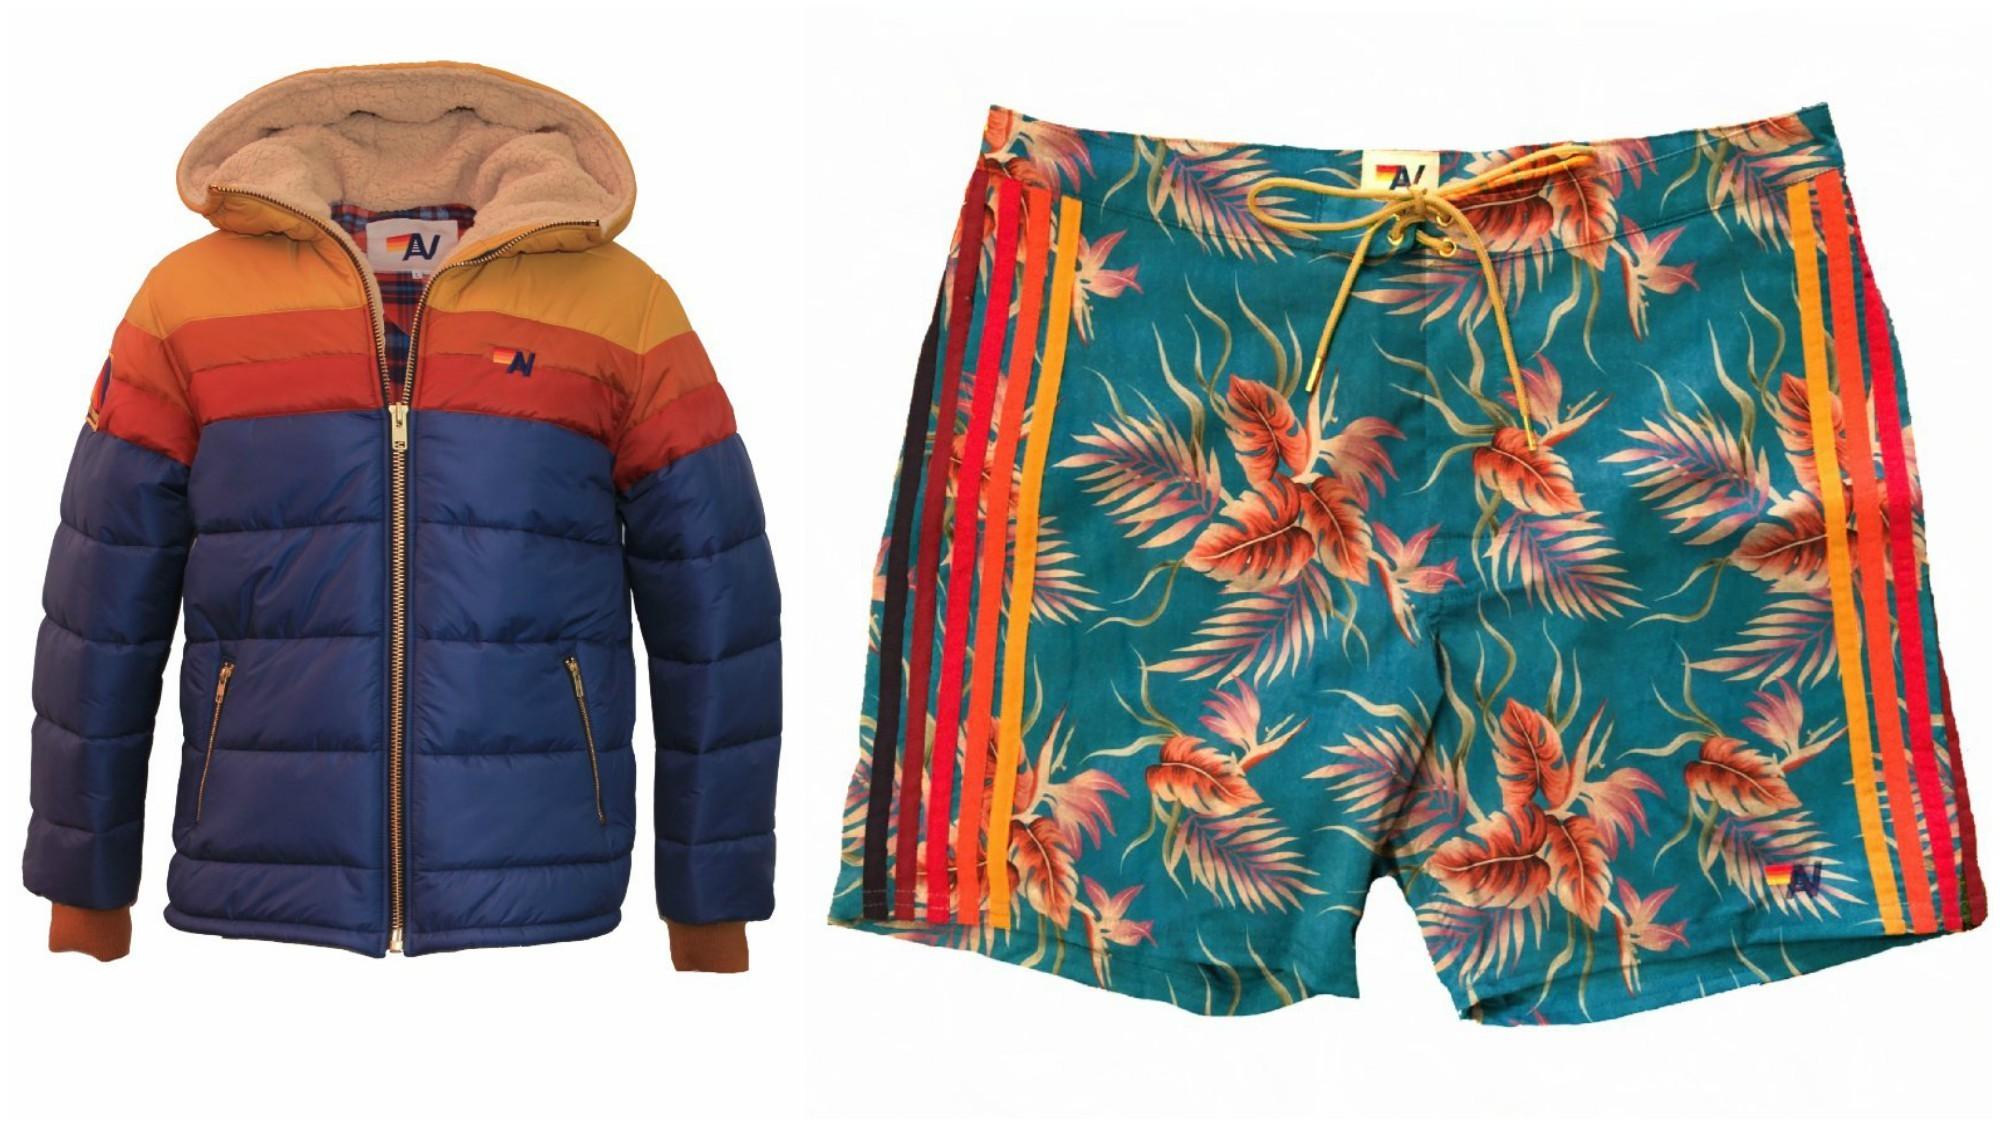 Aviator Nation unisex hooded Trekker puffer jacket with shearling lining, $649, and Aviator Nation men's Kauai Stripe board shorts, $159.99.